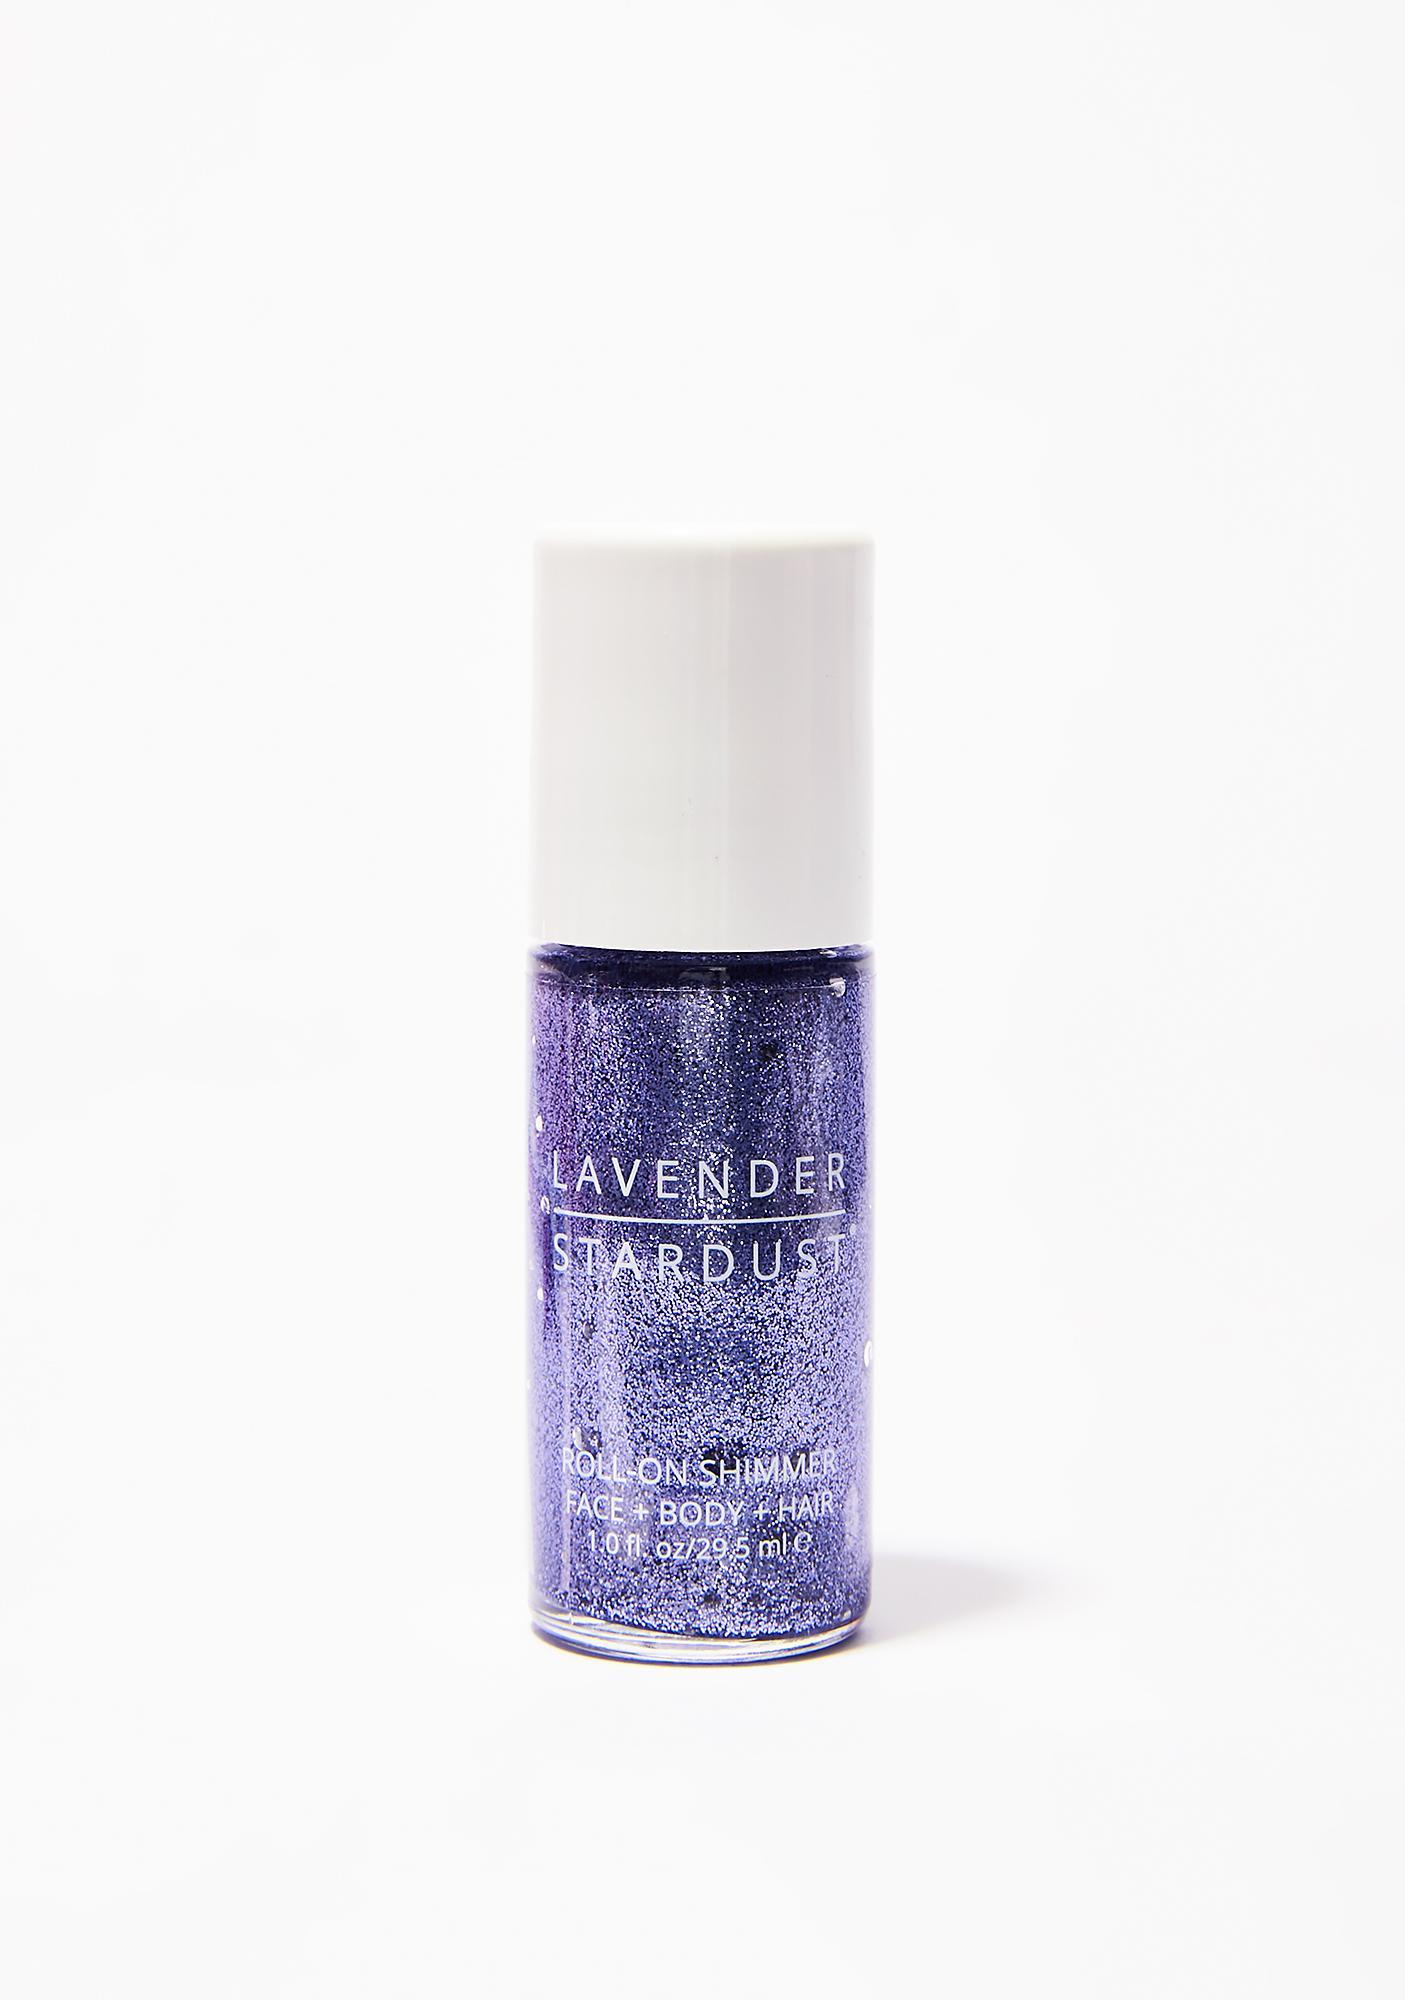 Lavender Stardust Amethyst Roll-On Shimmer Body Glitter